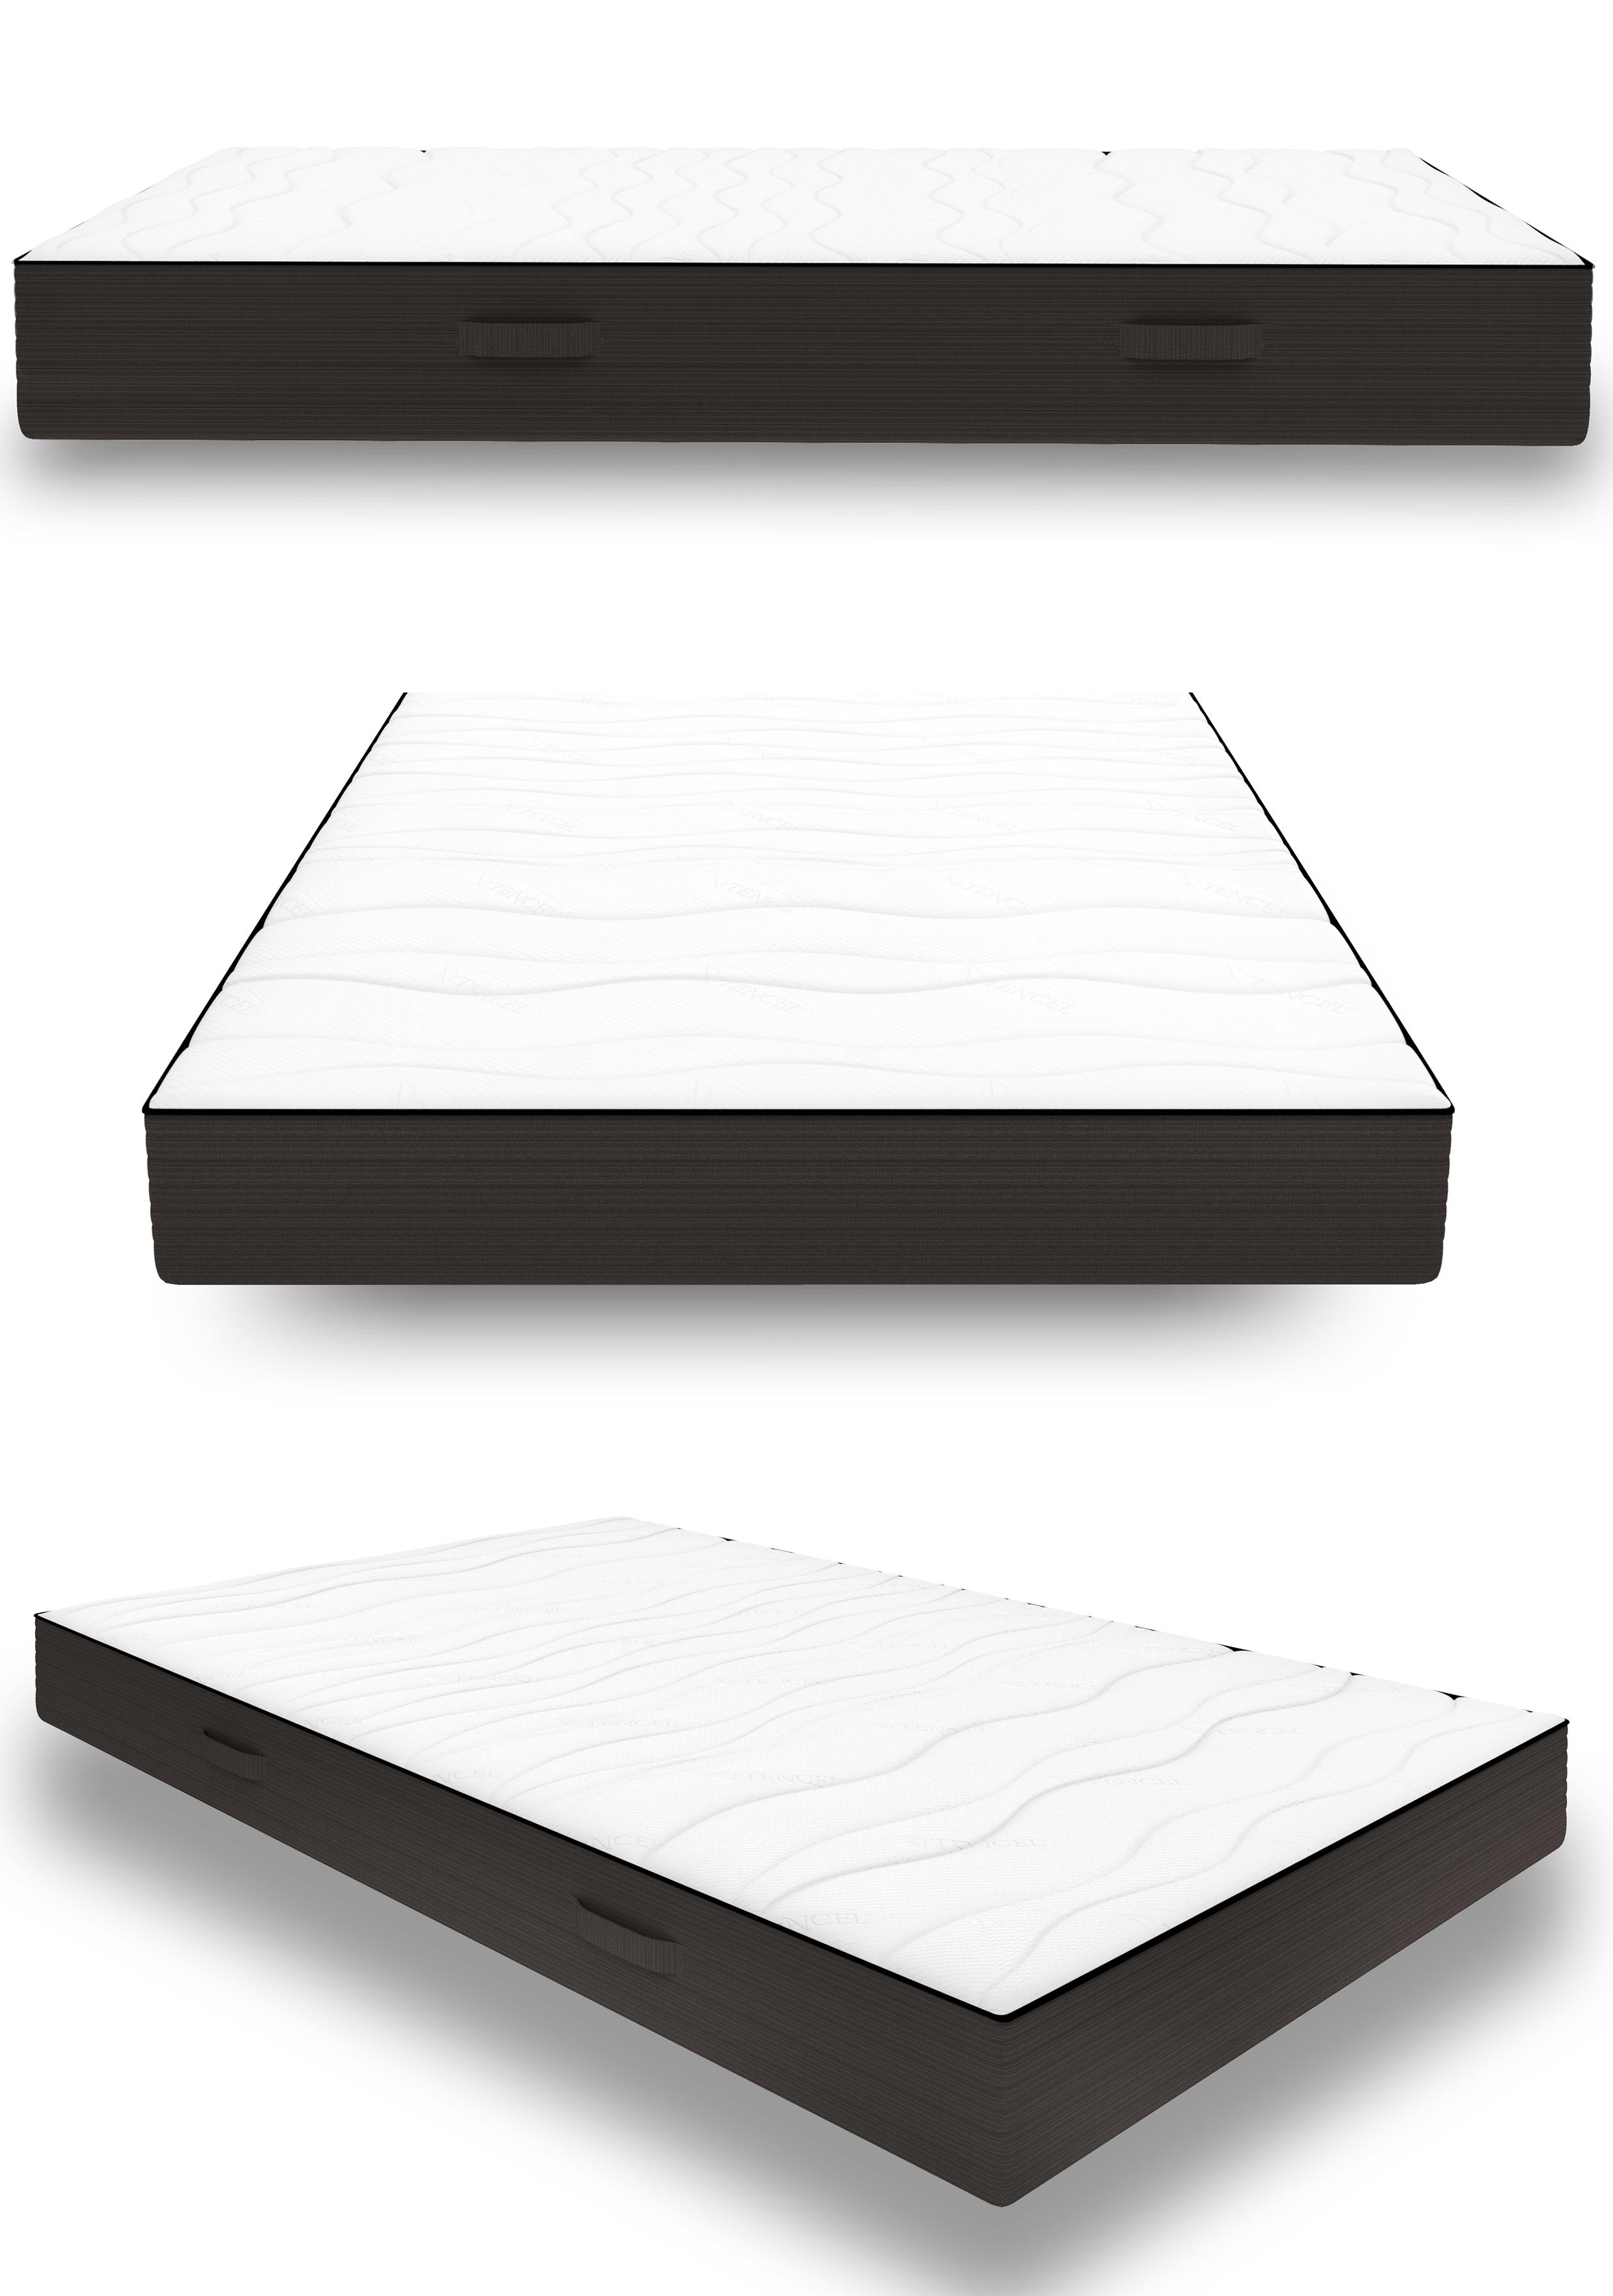 160x200 7 zonen qps one fits all matratze rasti weich fest inkl wendekern. Black Bedroom Furniture Sets. Home Design Ideas